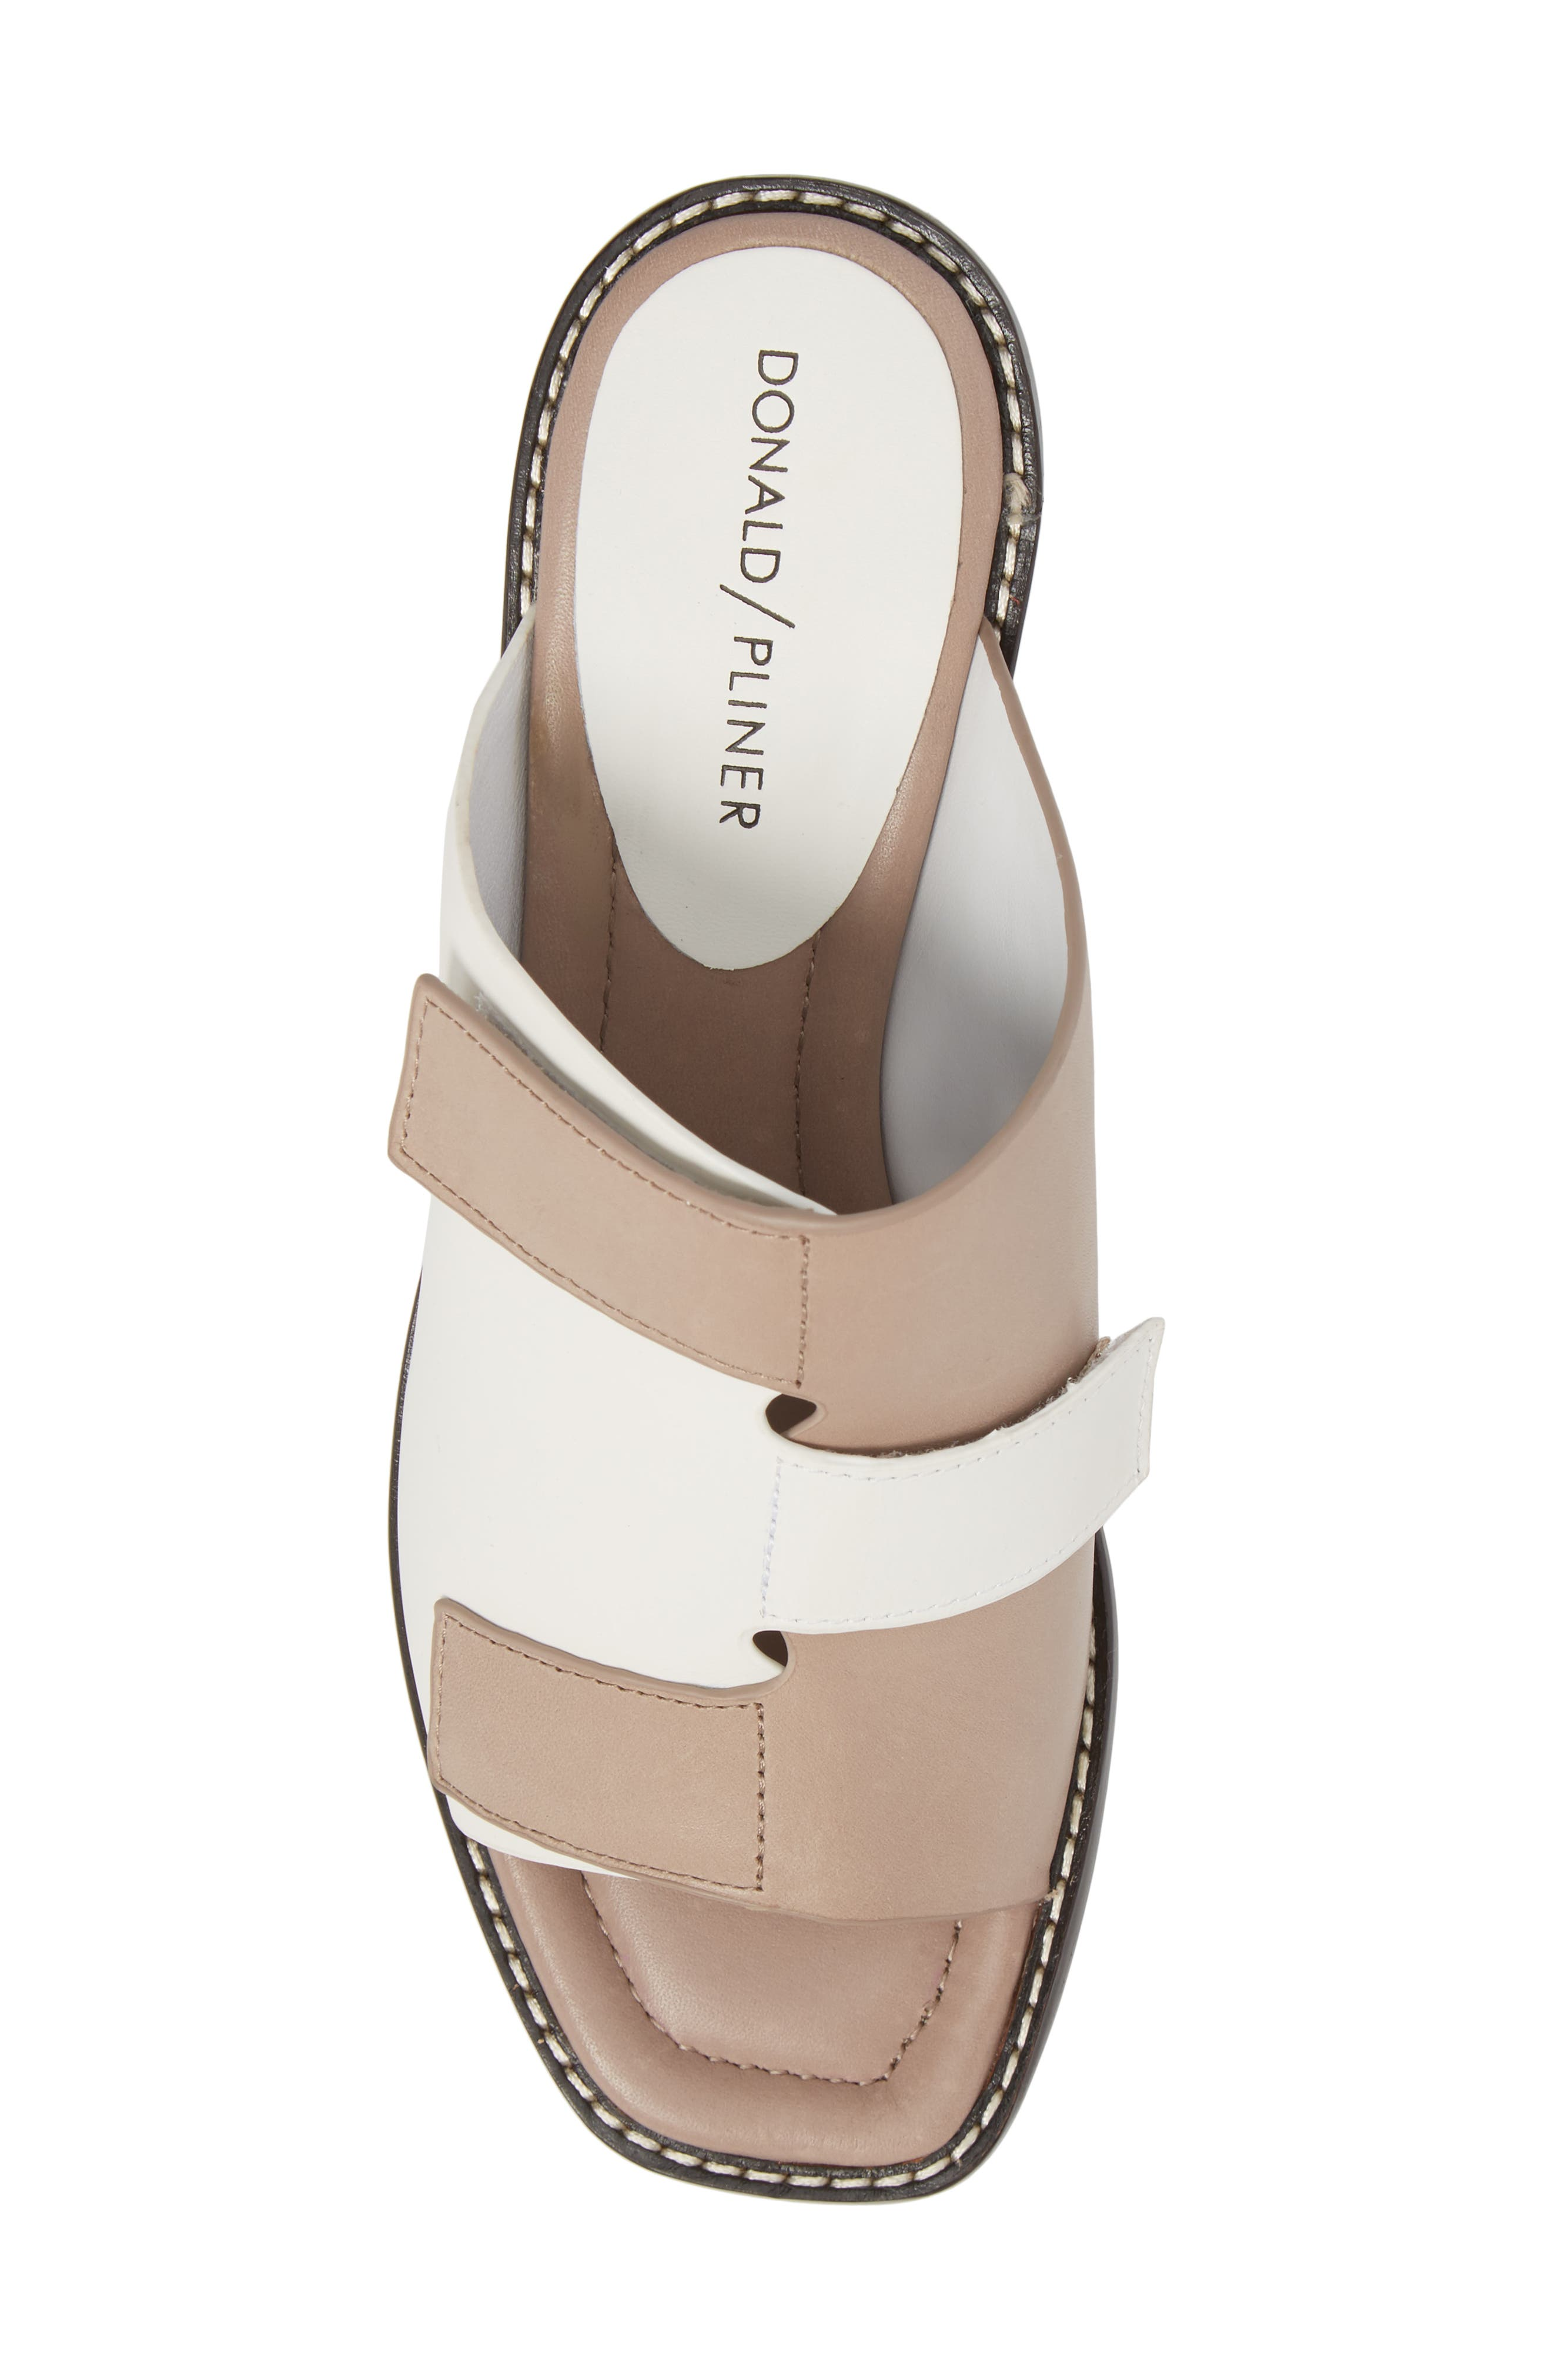 Amalia Block Heel Sandal,                             Alternate thumbnail 5, color,                             Bone Leather